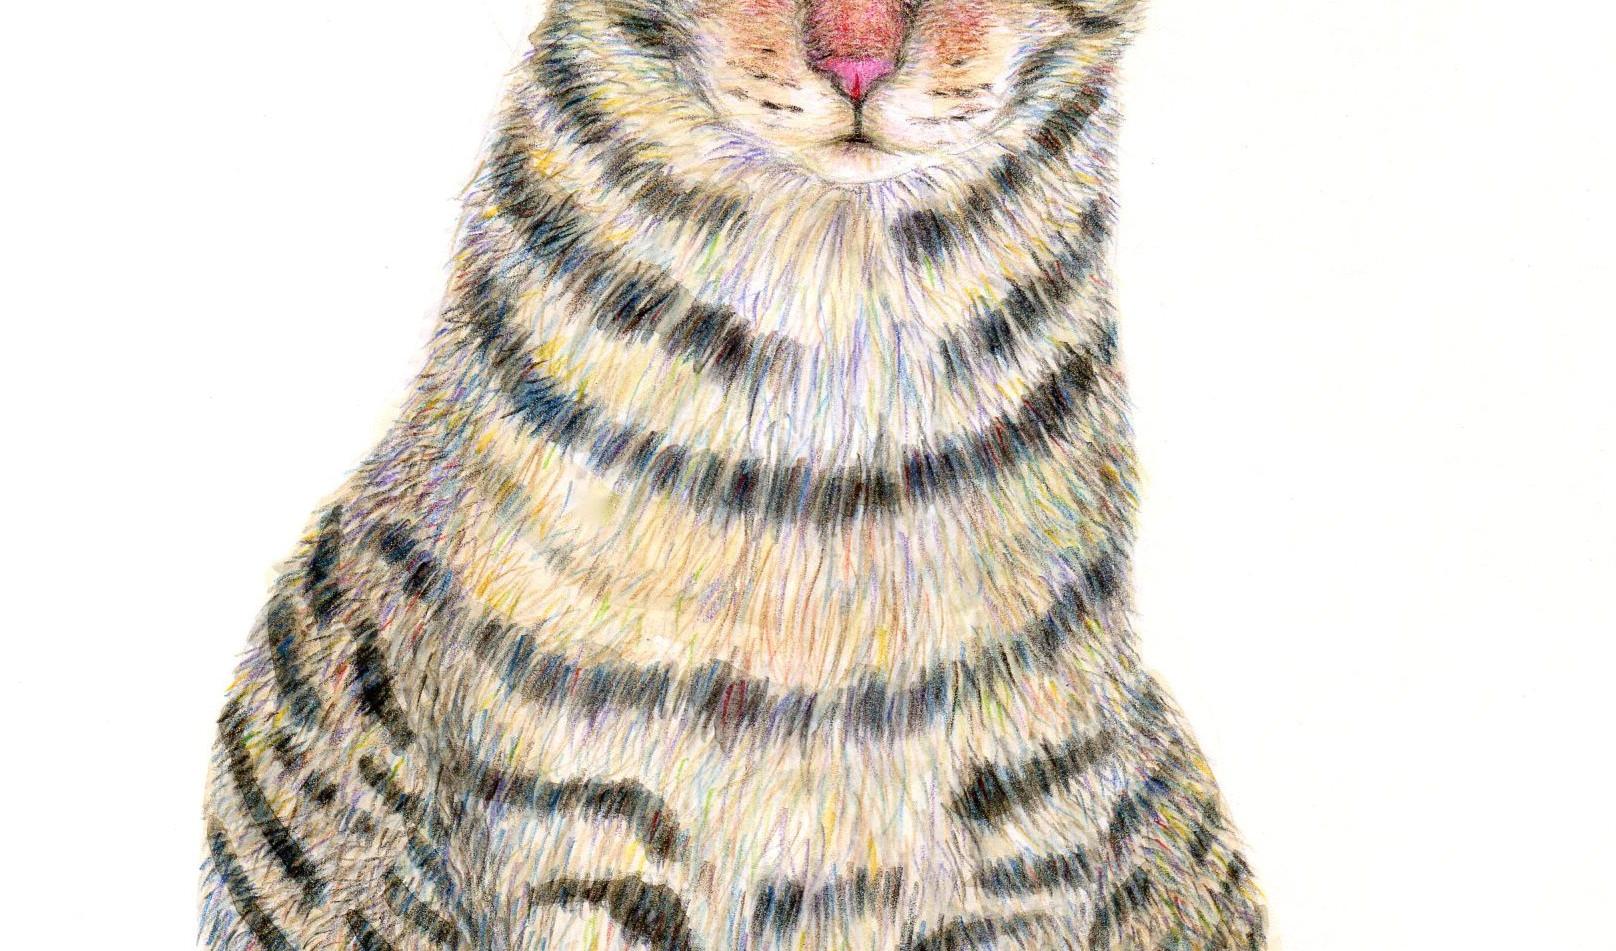 521-a sweet tabby cat